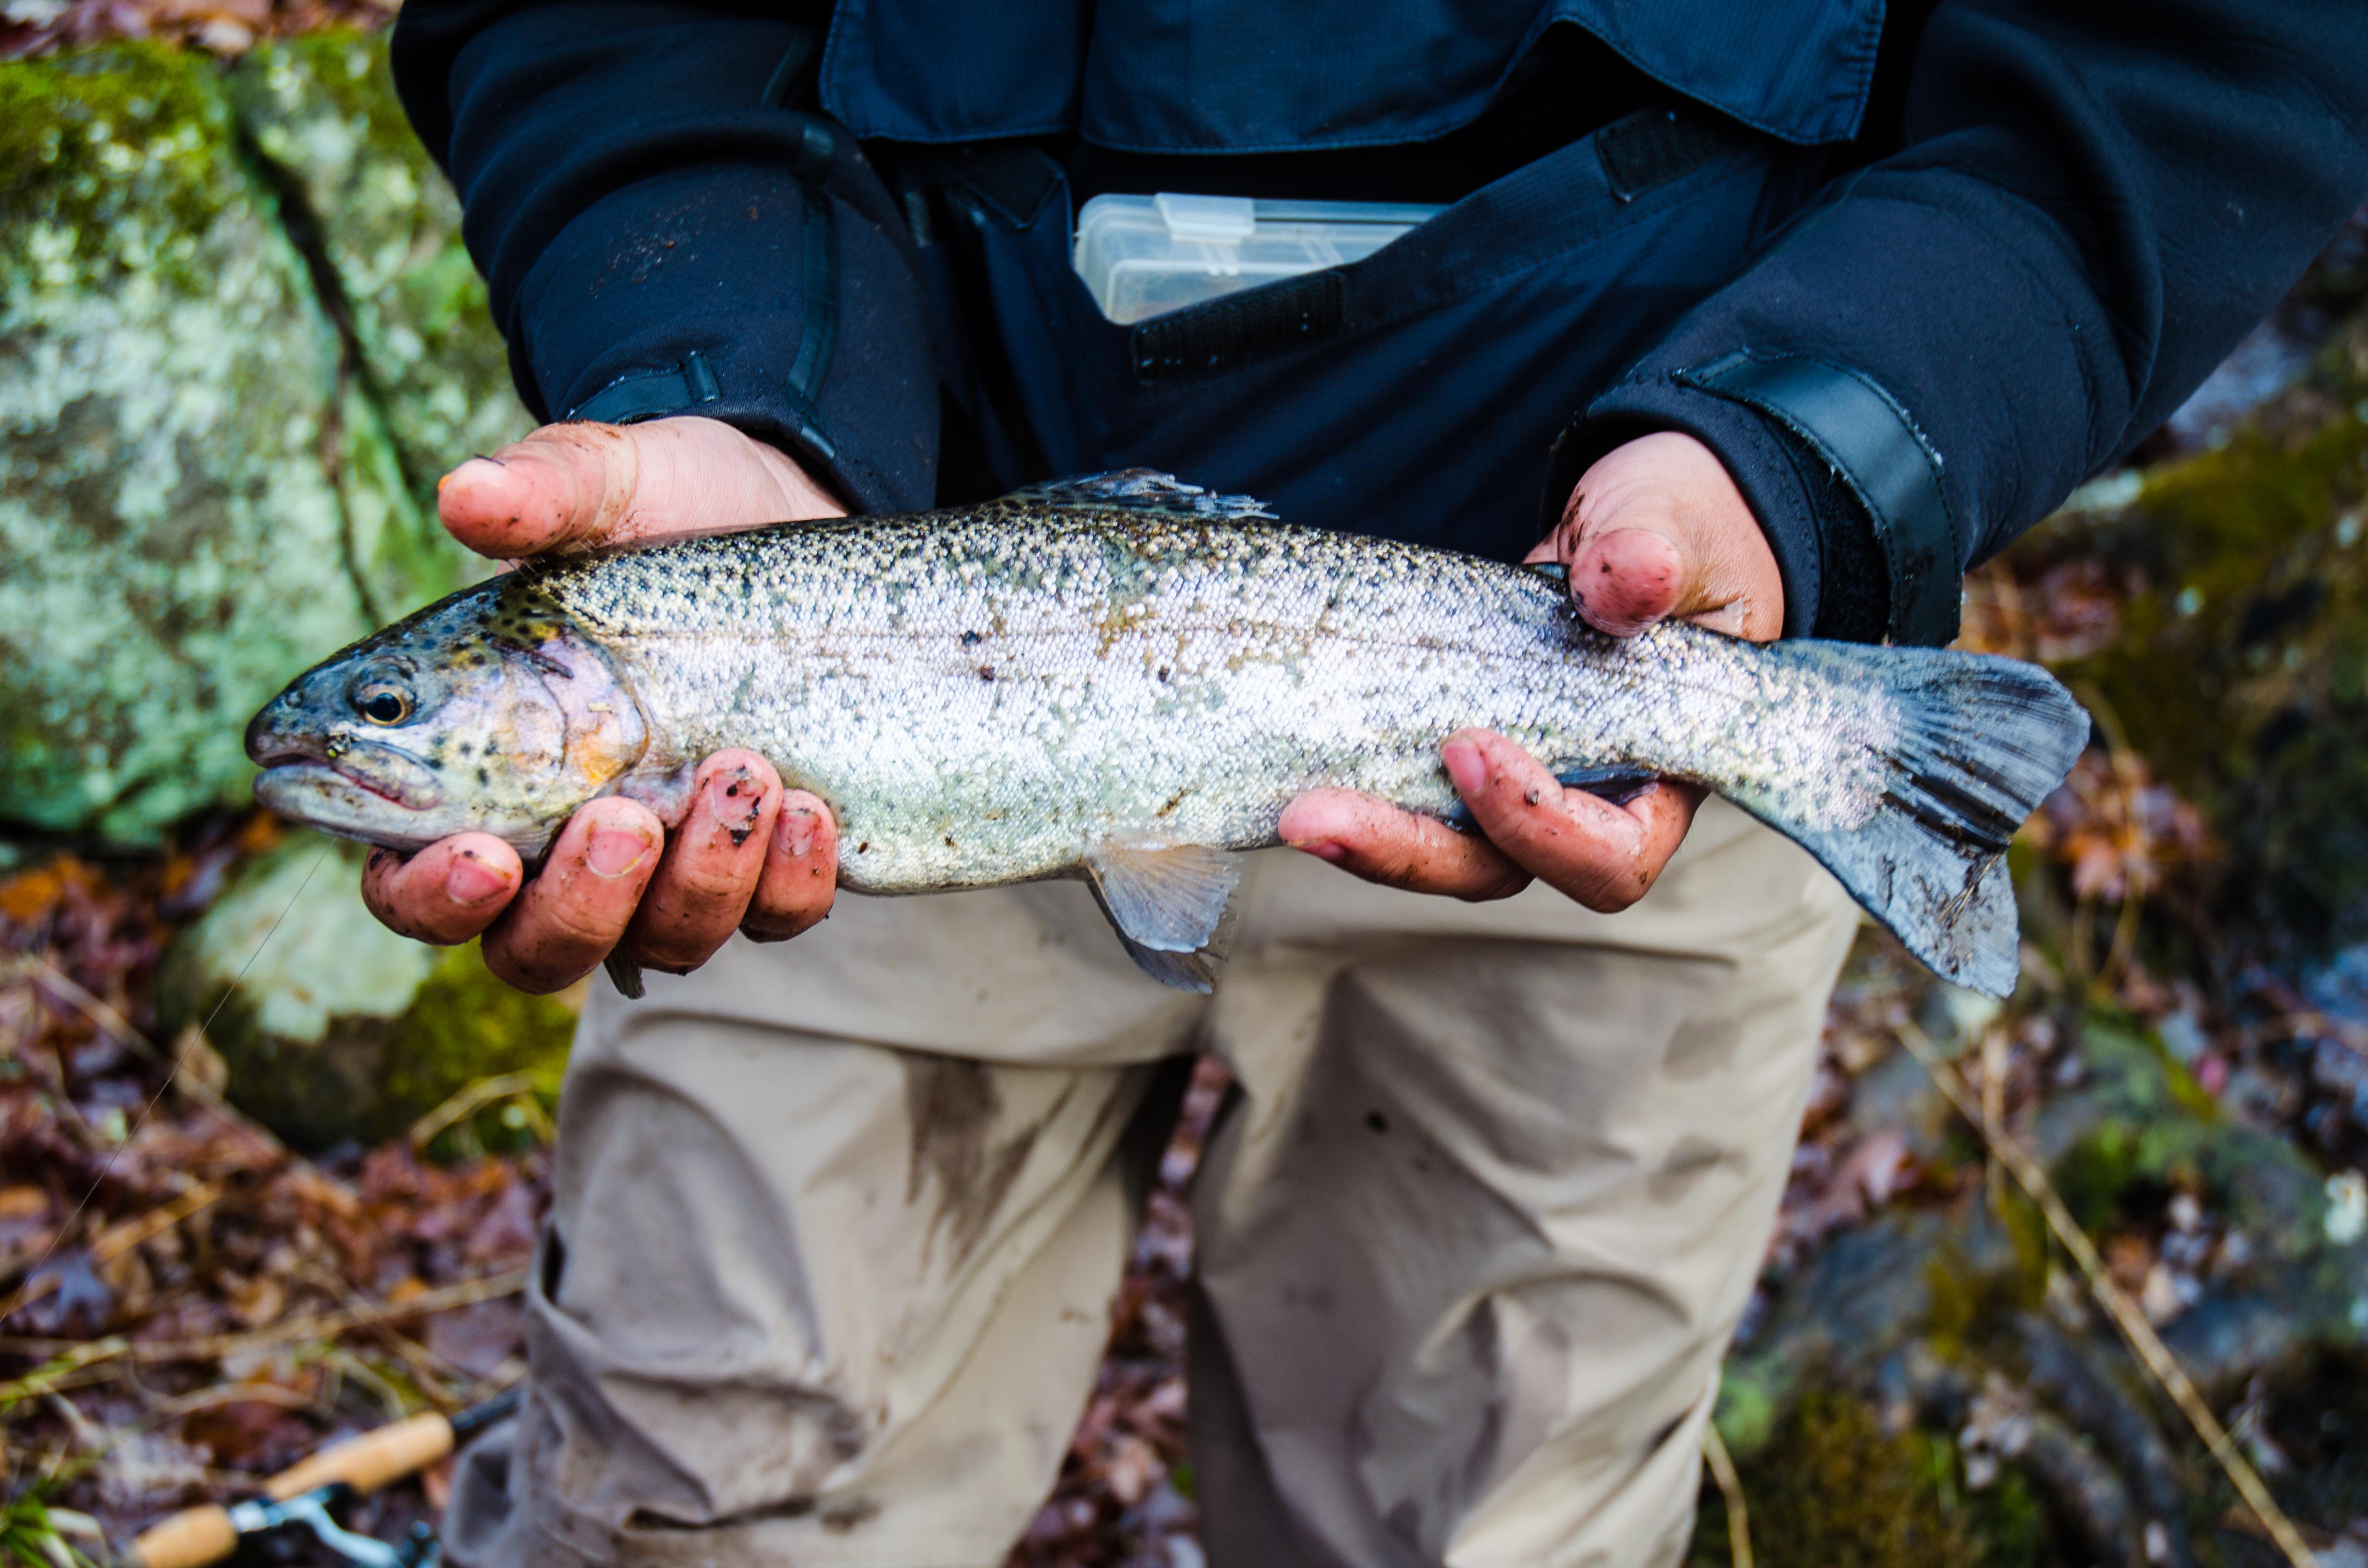 Pa trout stocking dates